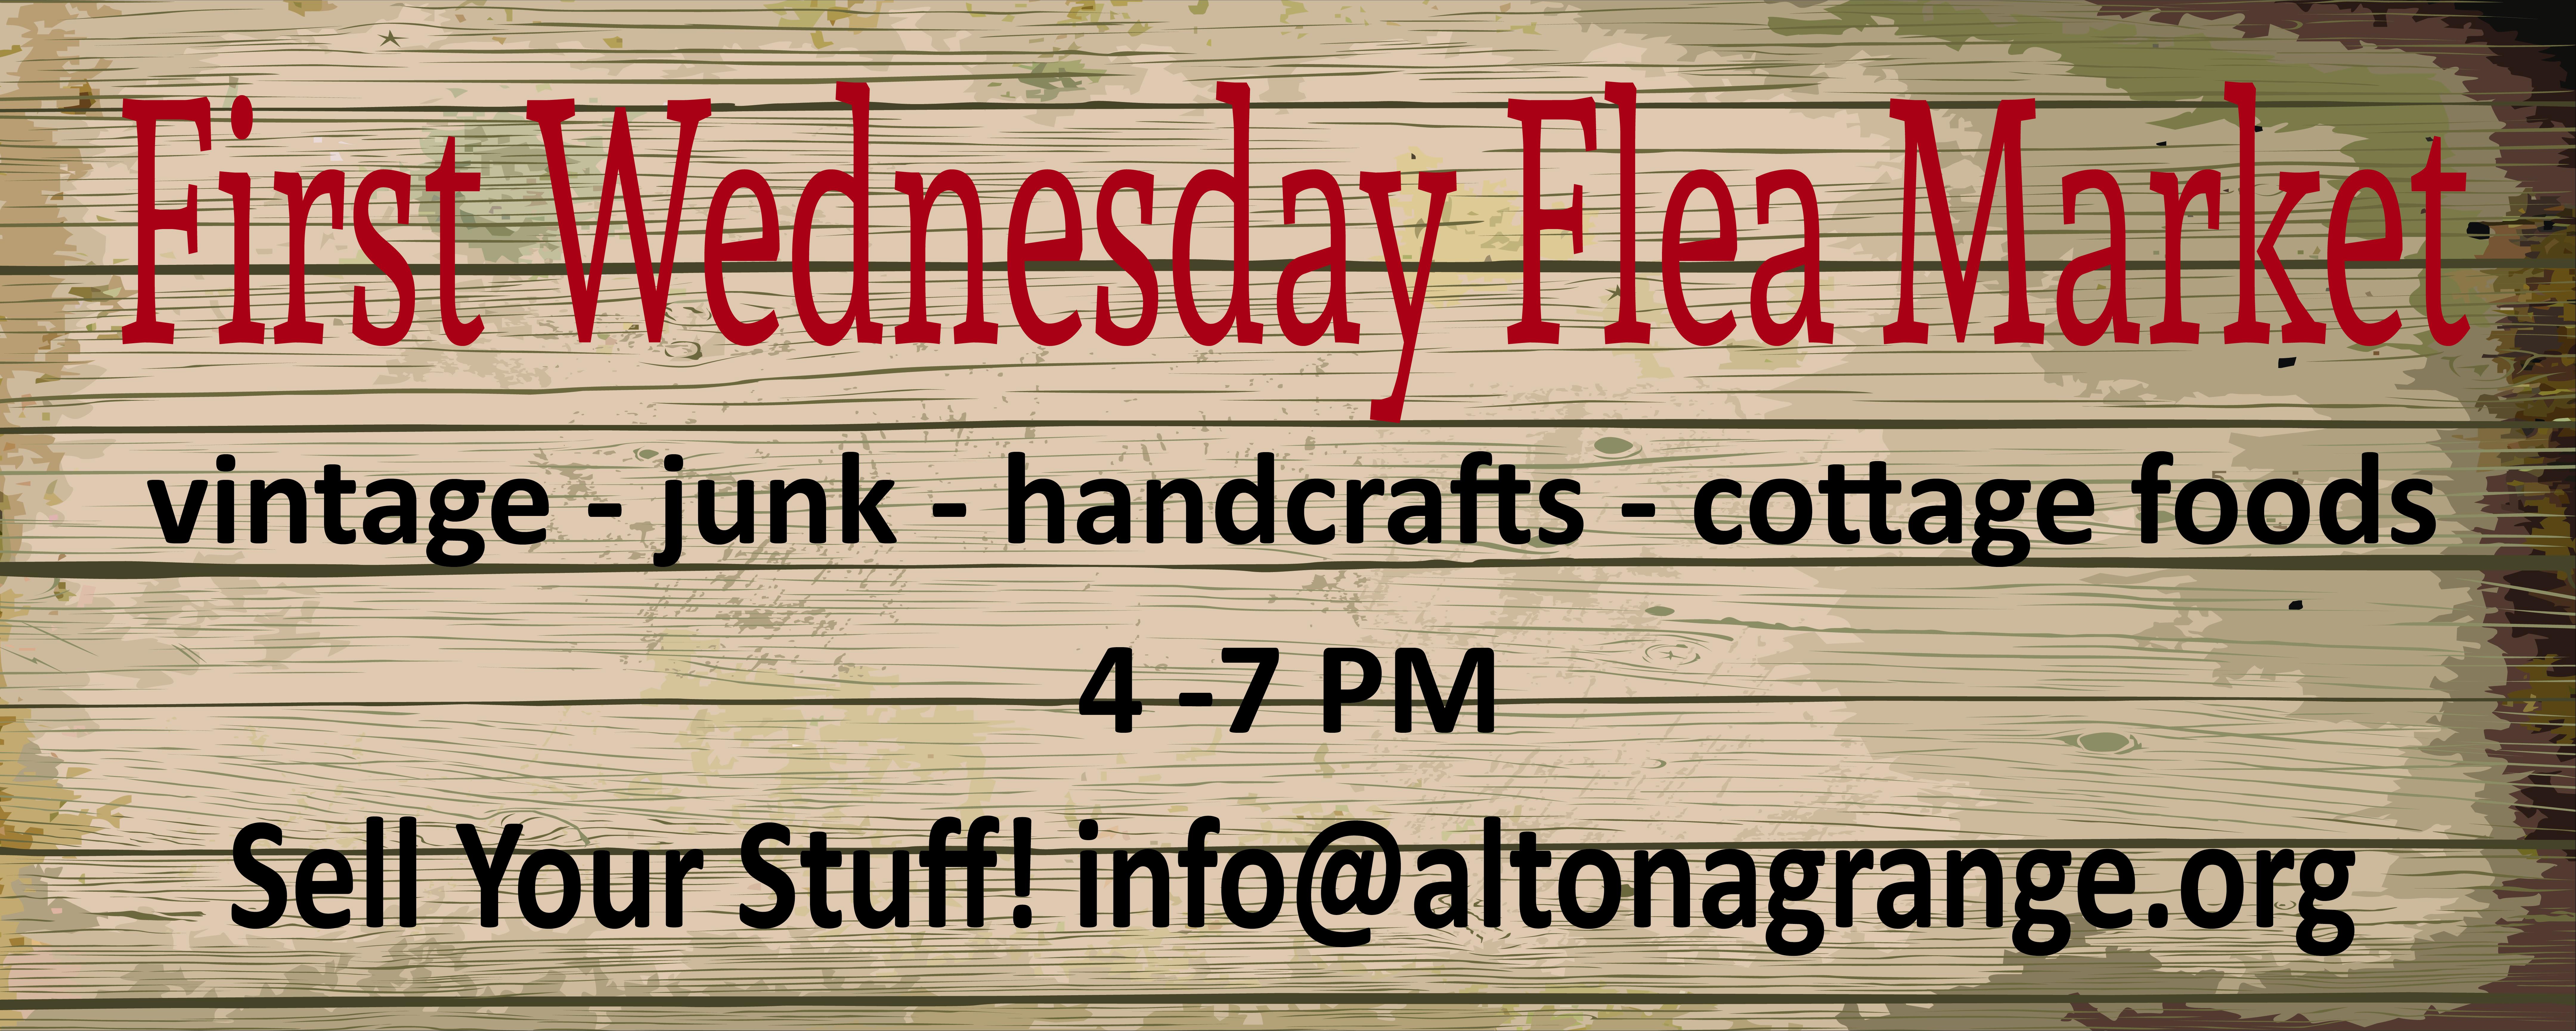 First Wednesday Flea Market